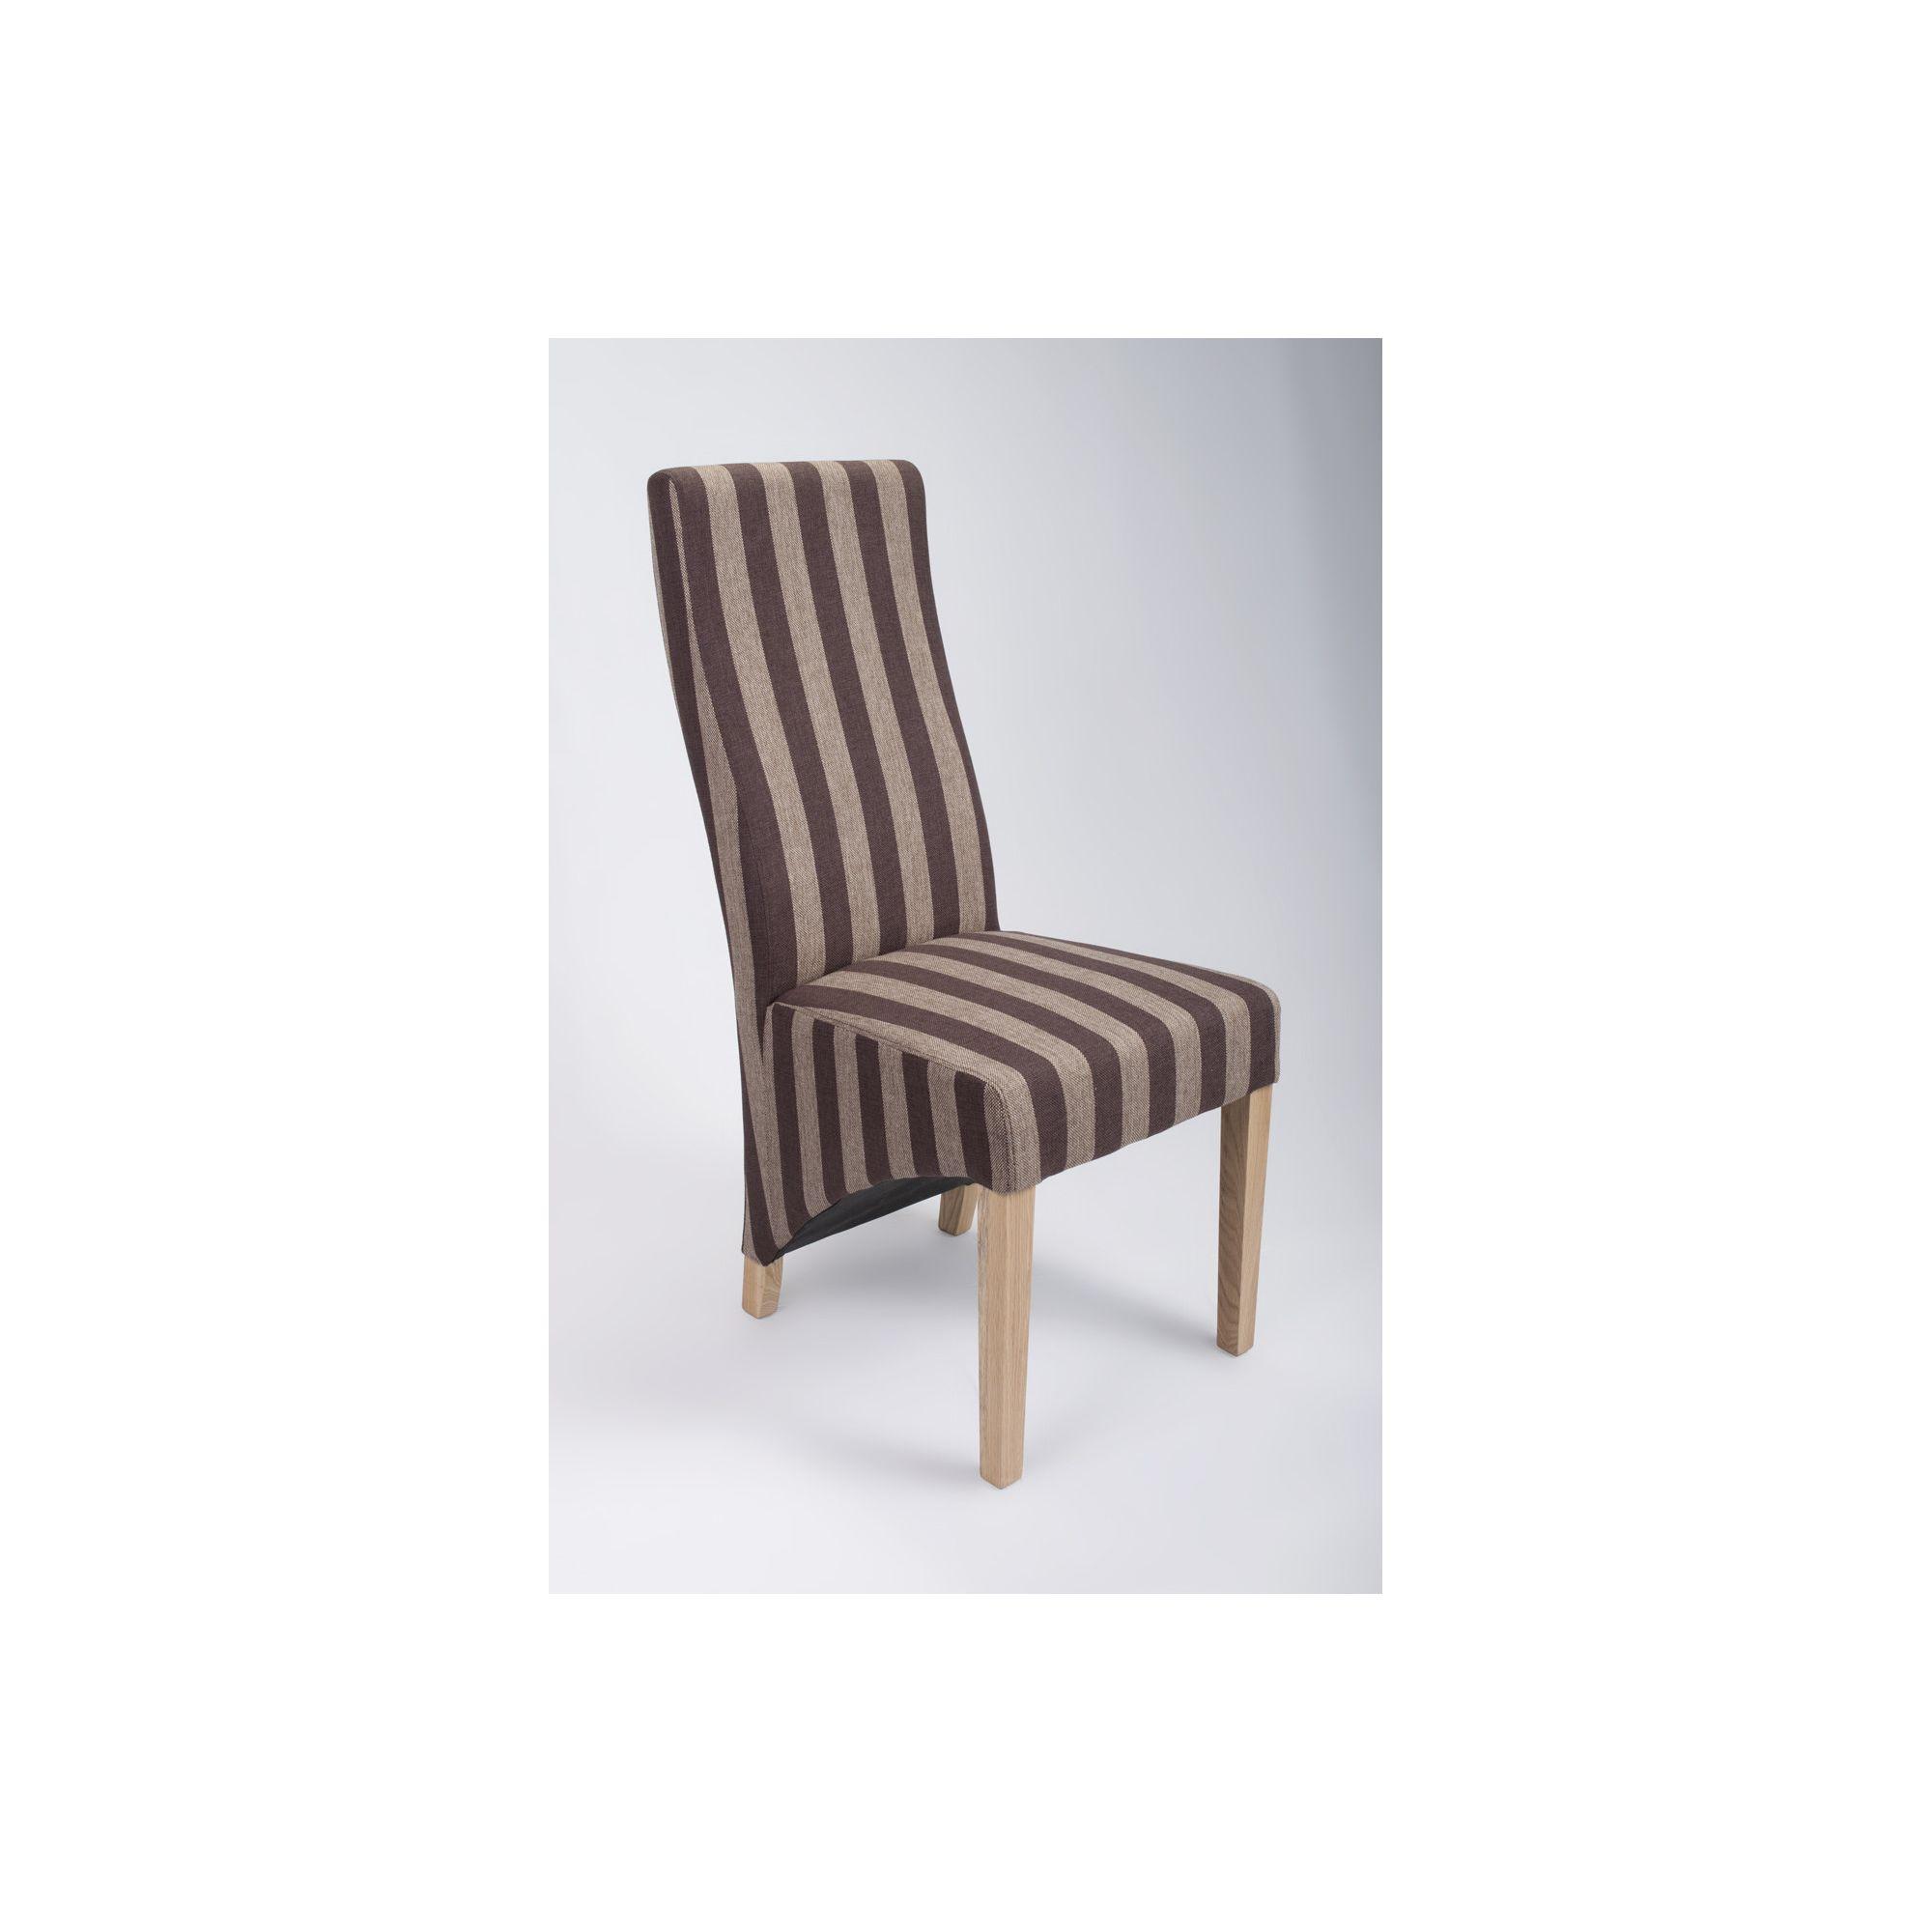 Shankar Enterprises Baxter Dining Chair (Set of 2)